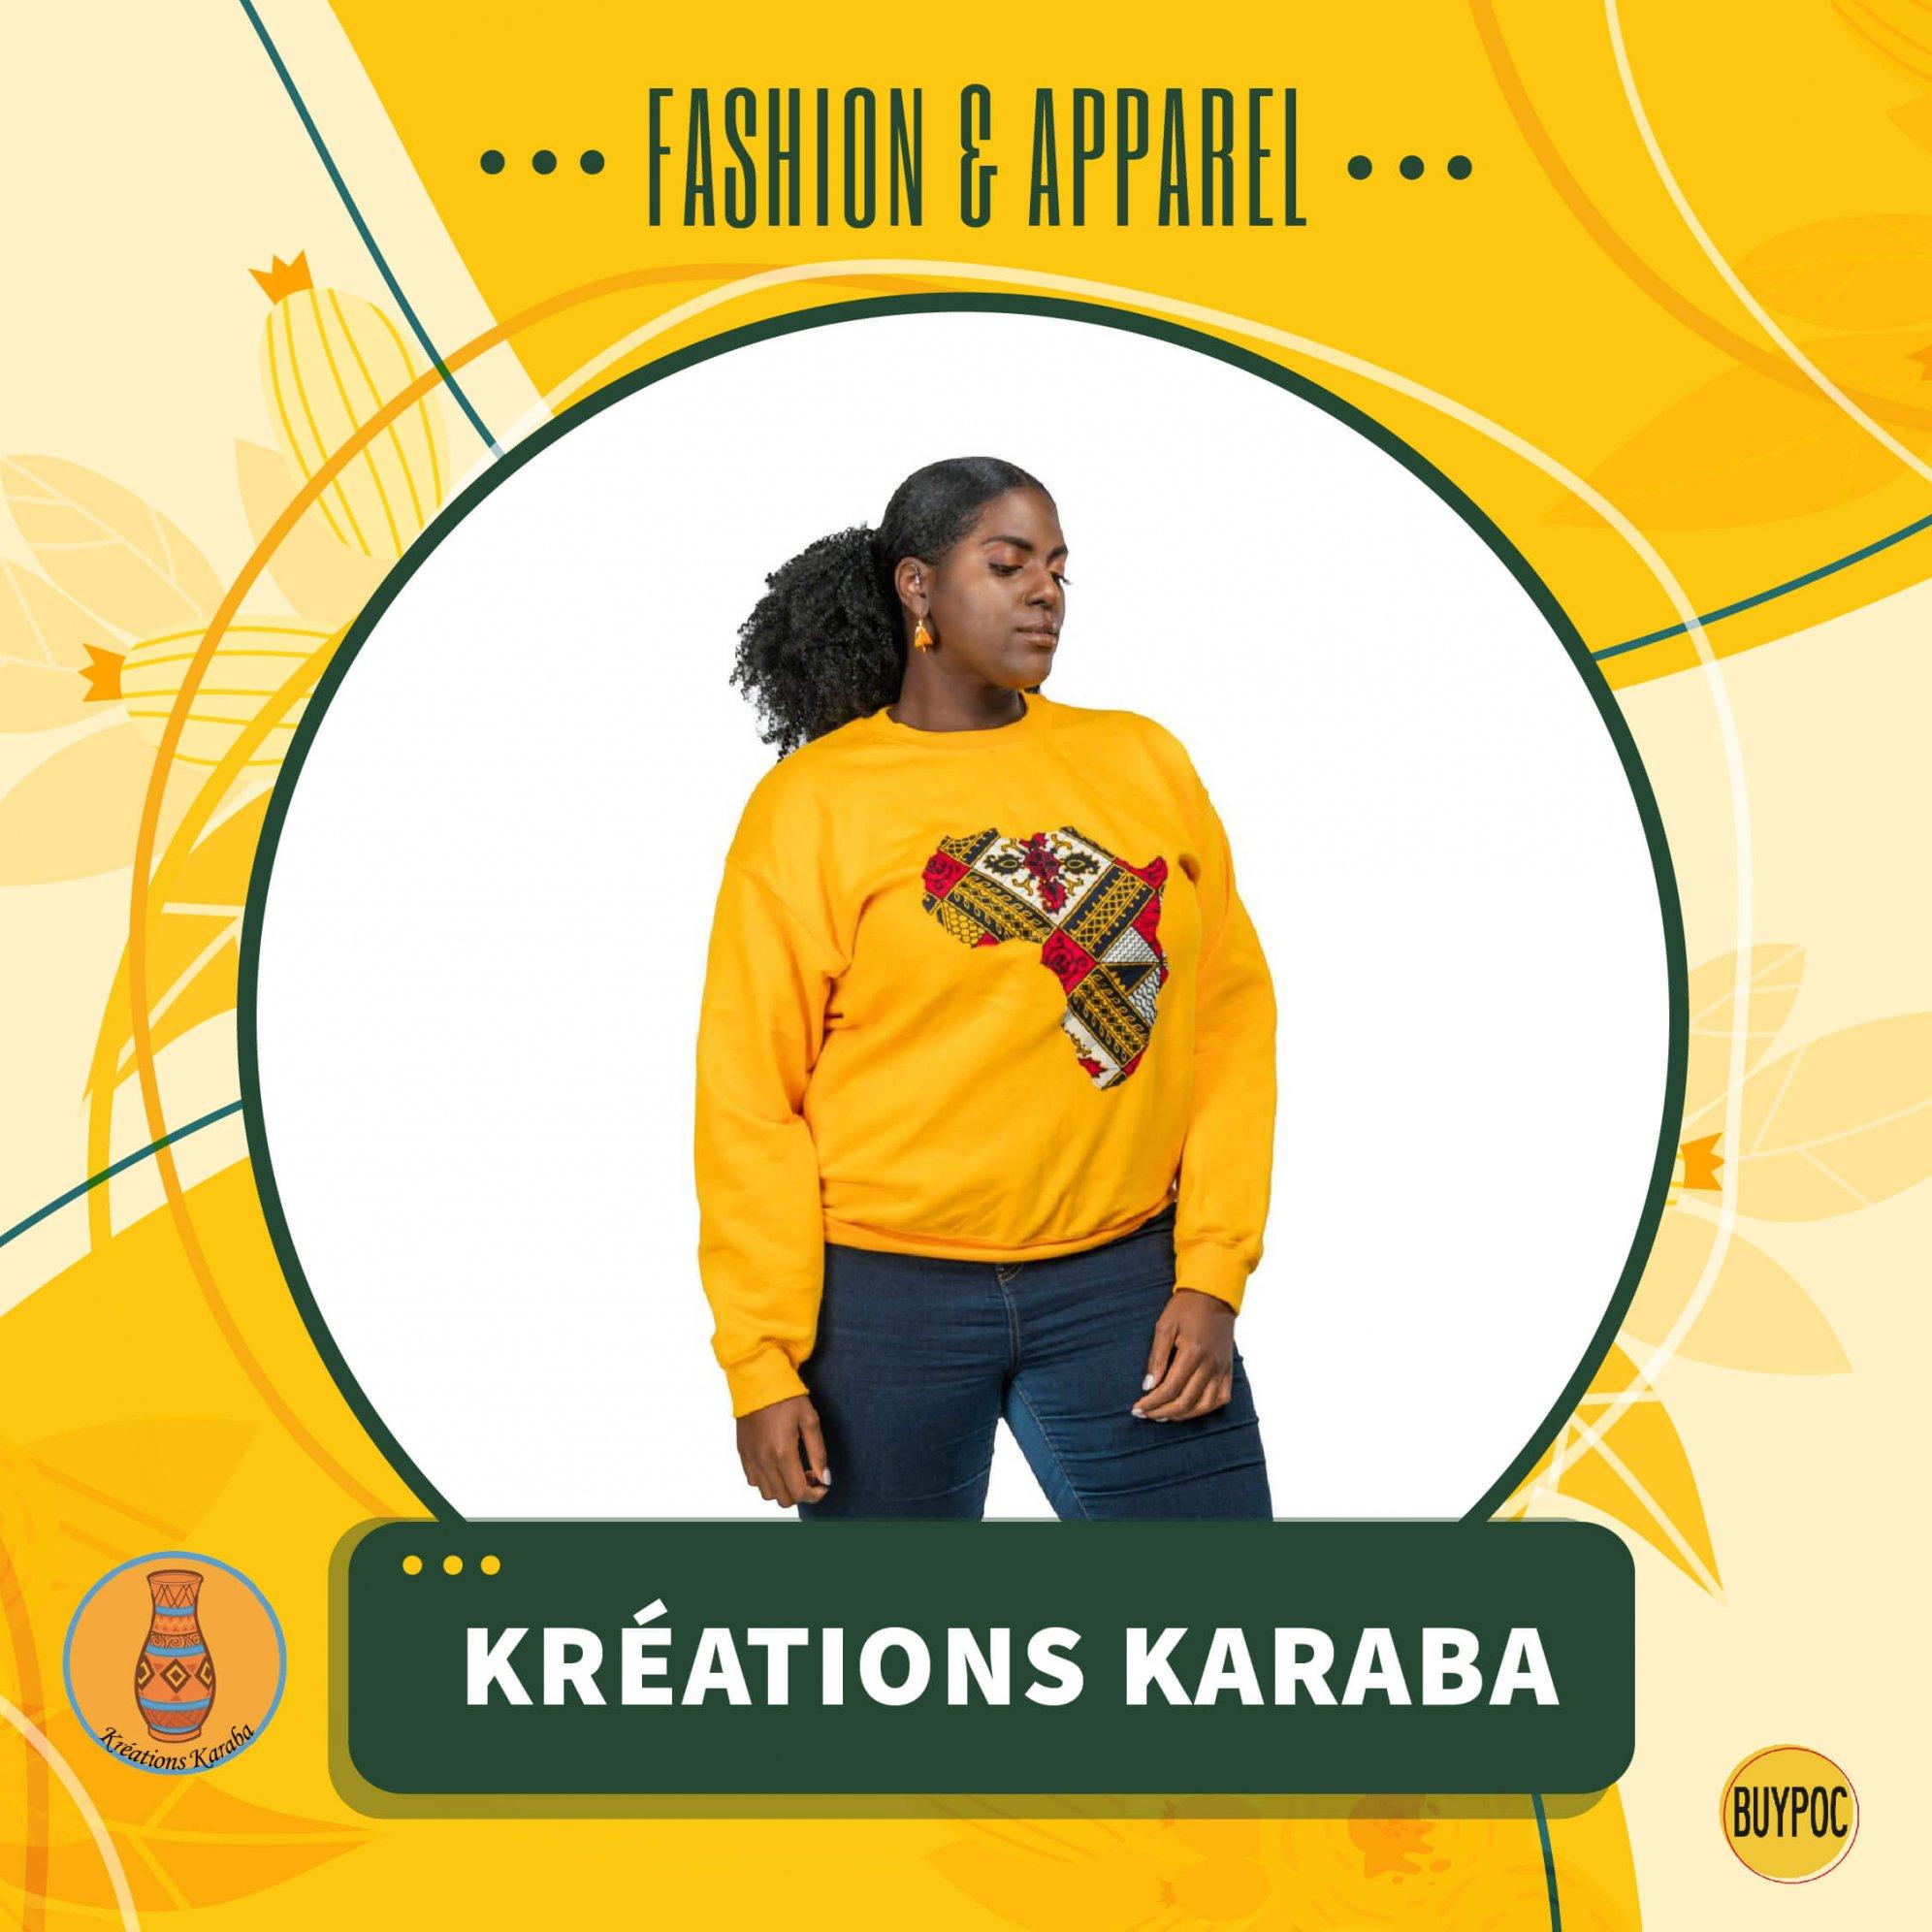 Kréations Karaba